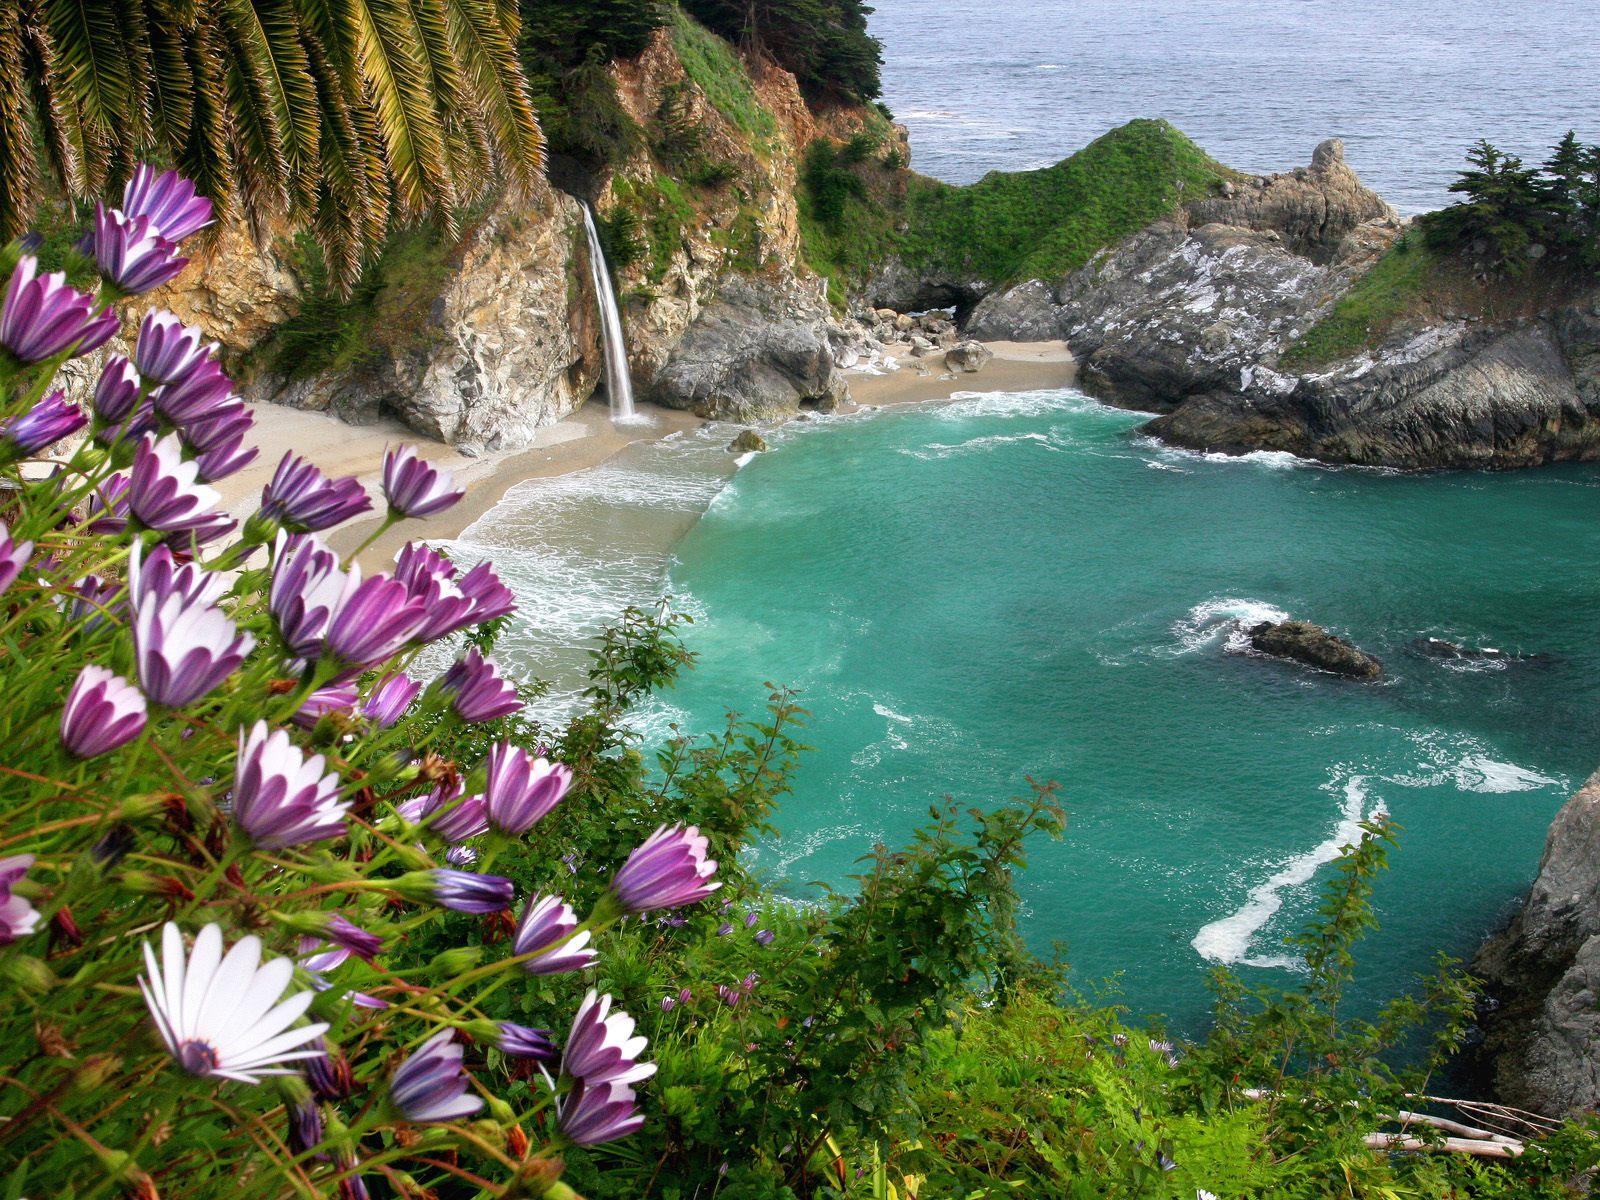 cascadas de agua frente al mar